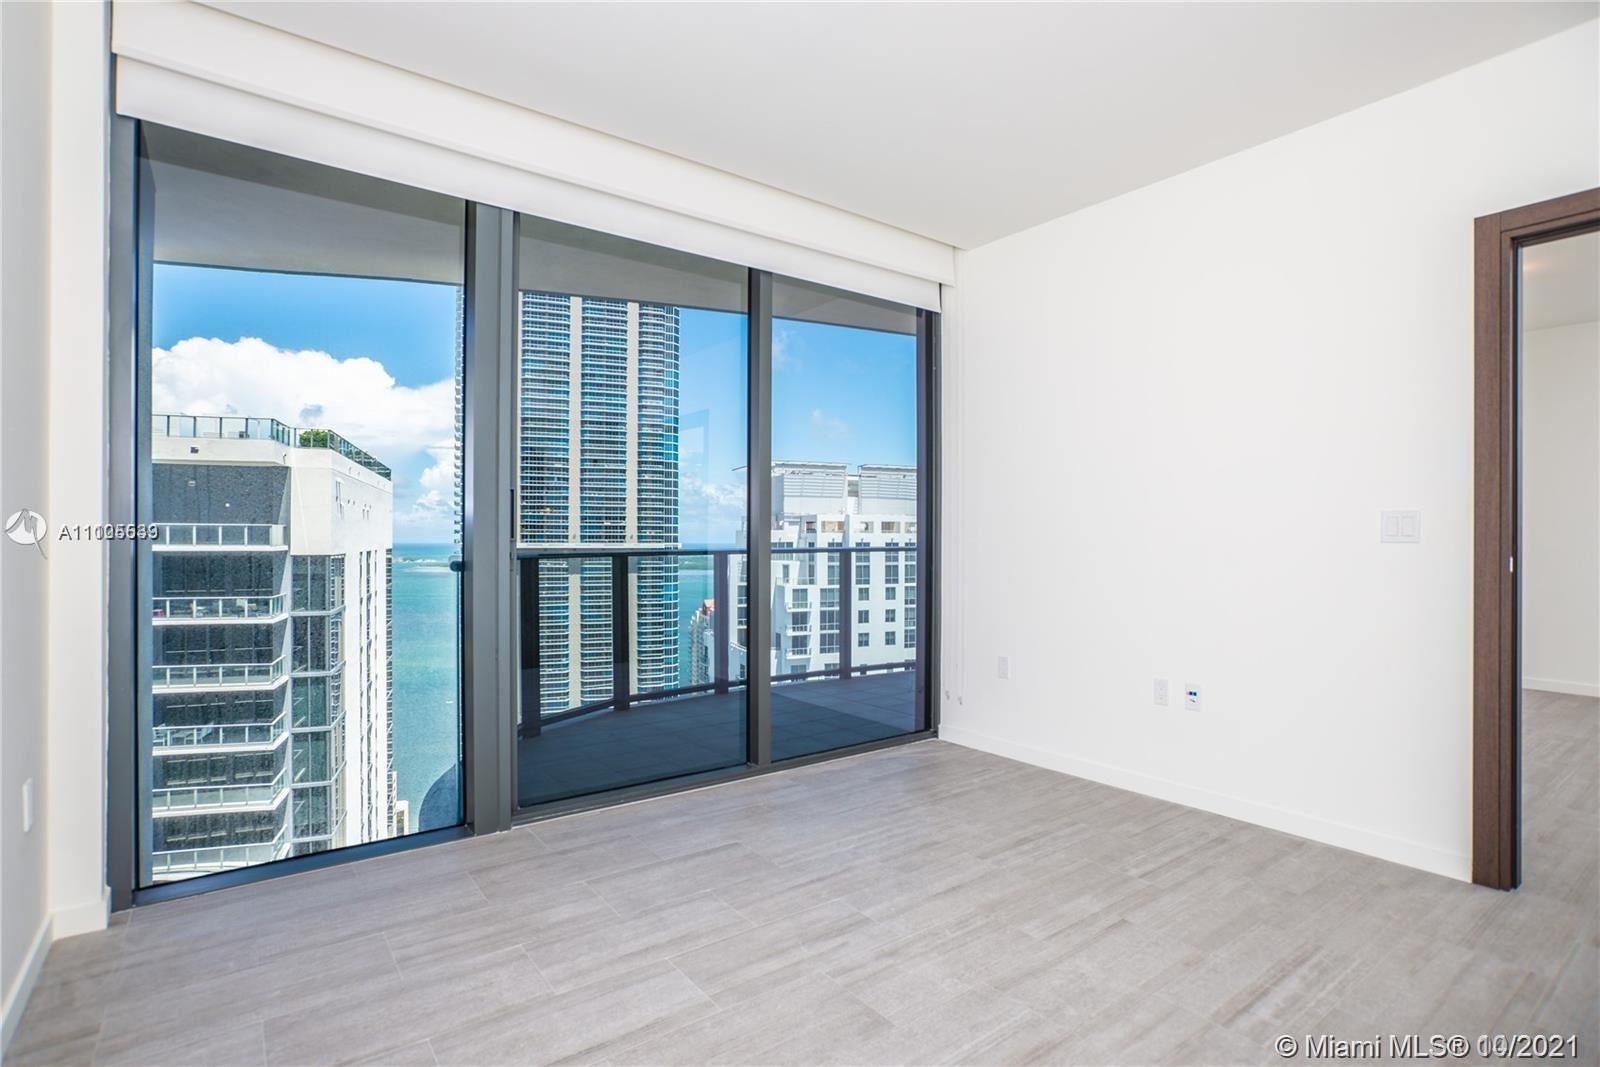 1000 Brickell Plz #4903, Miami, FL 33131 - #: A11105539